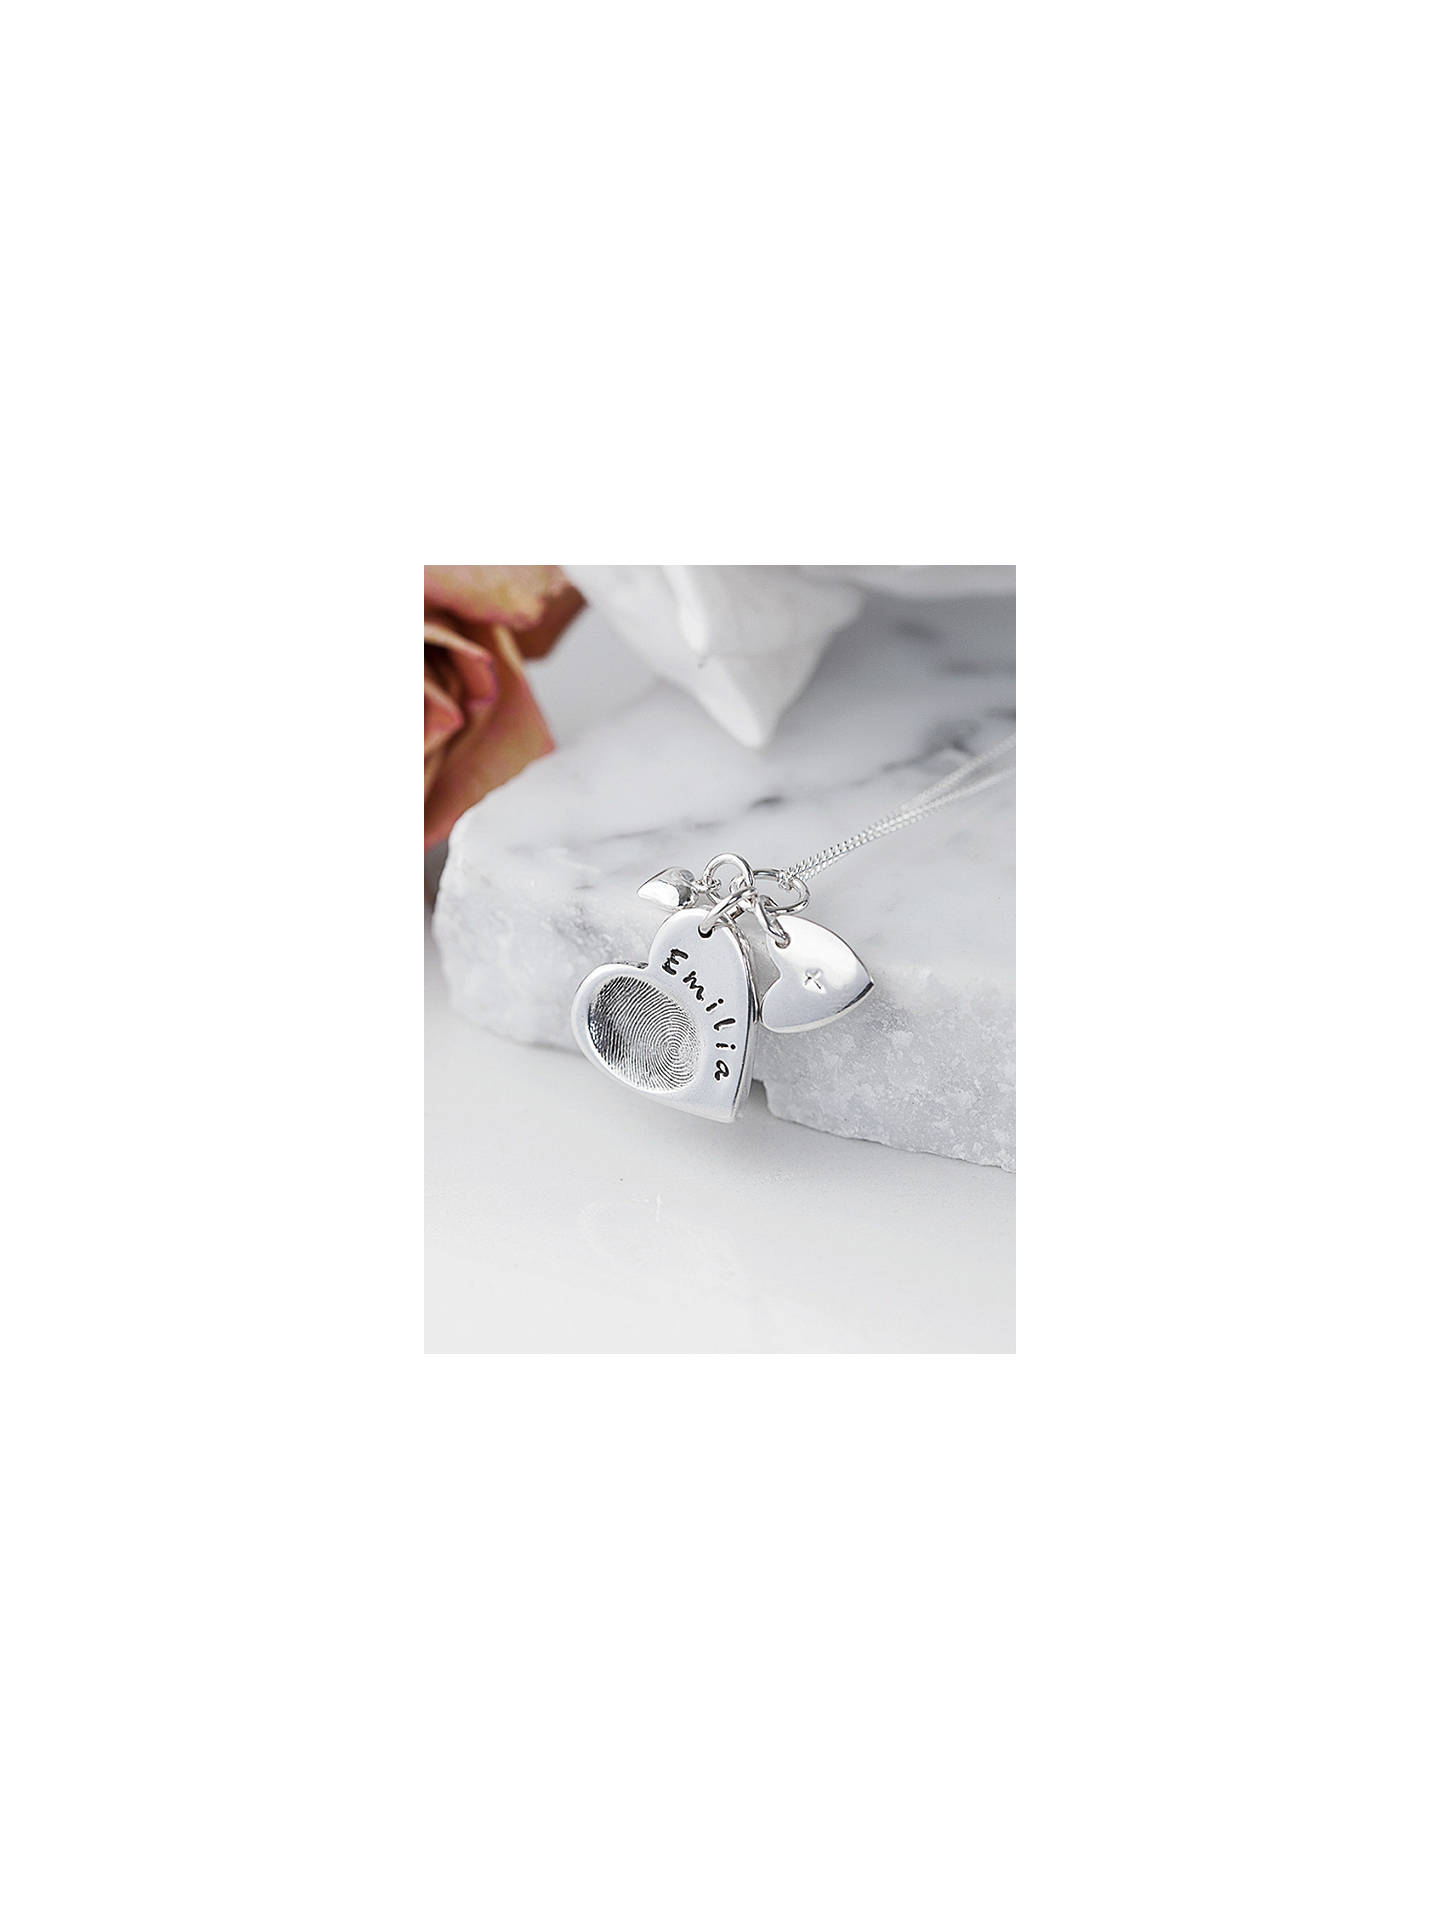 cd3ea5b1f Buy Under the Rose Personalised Fingerprint Charm Necklace Online at  johnlewis.com ...